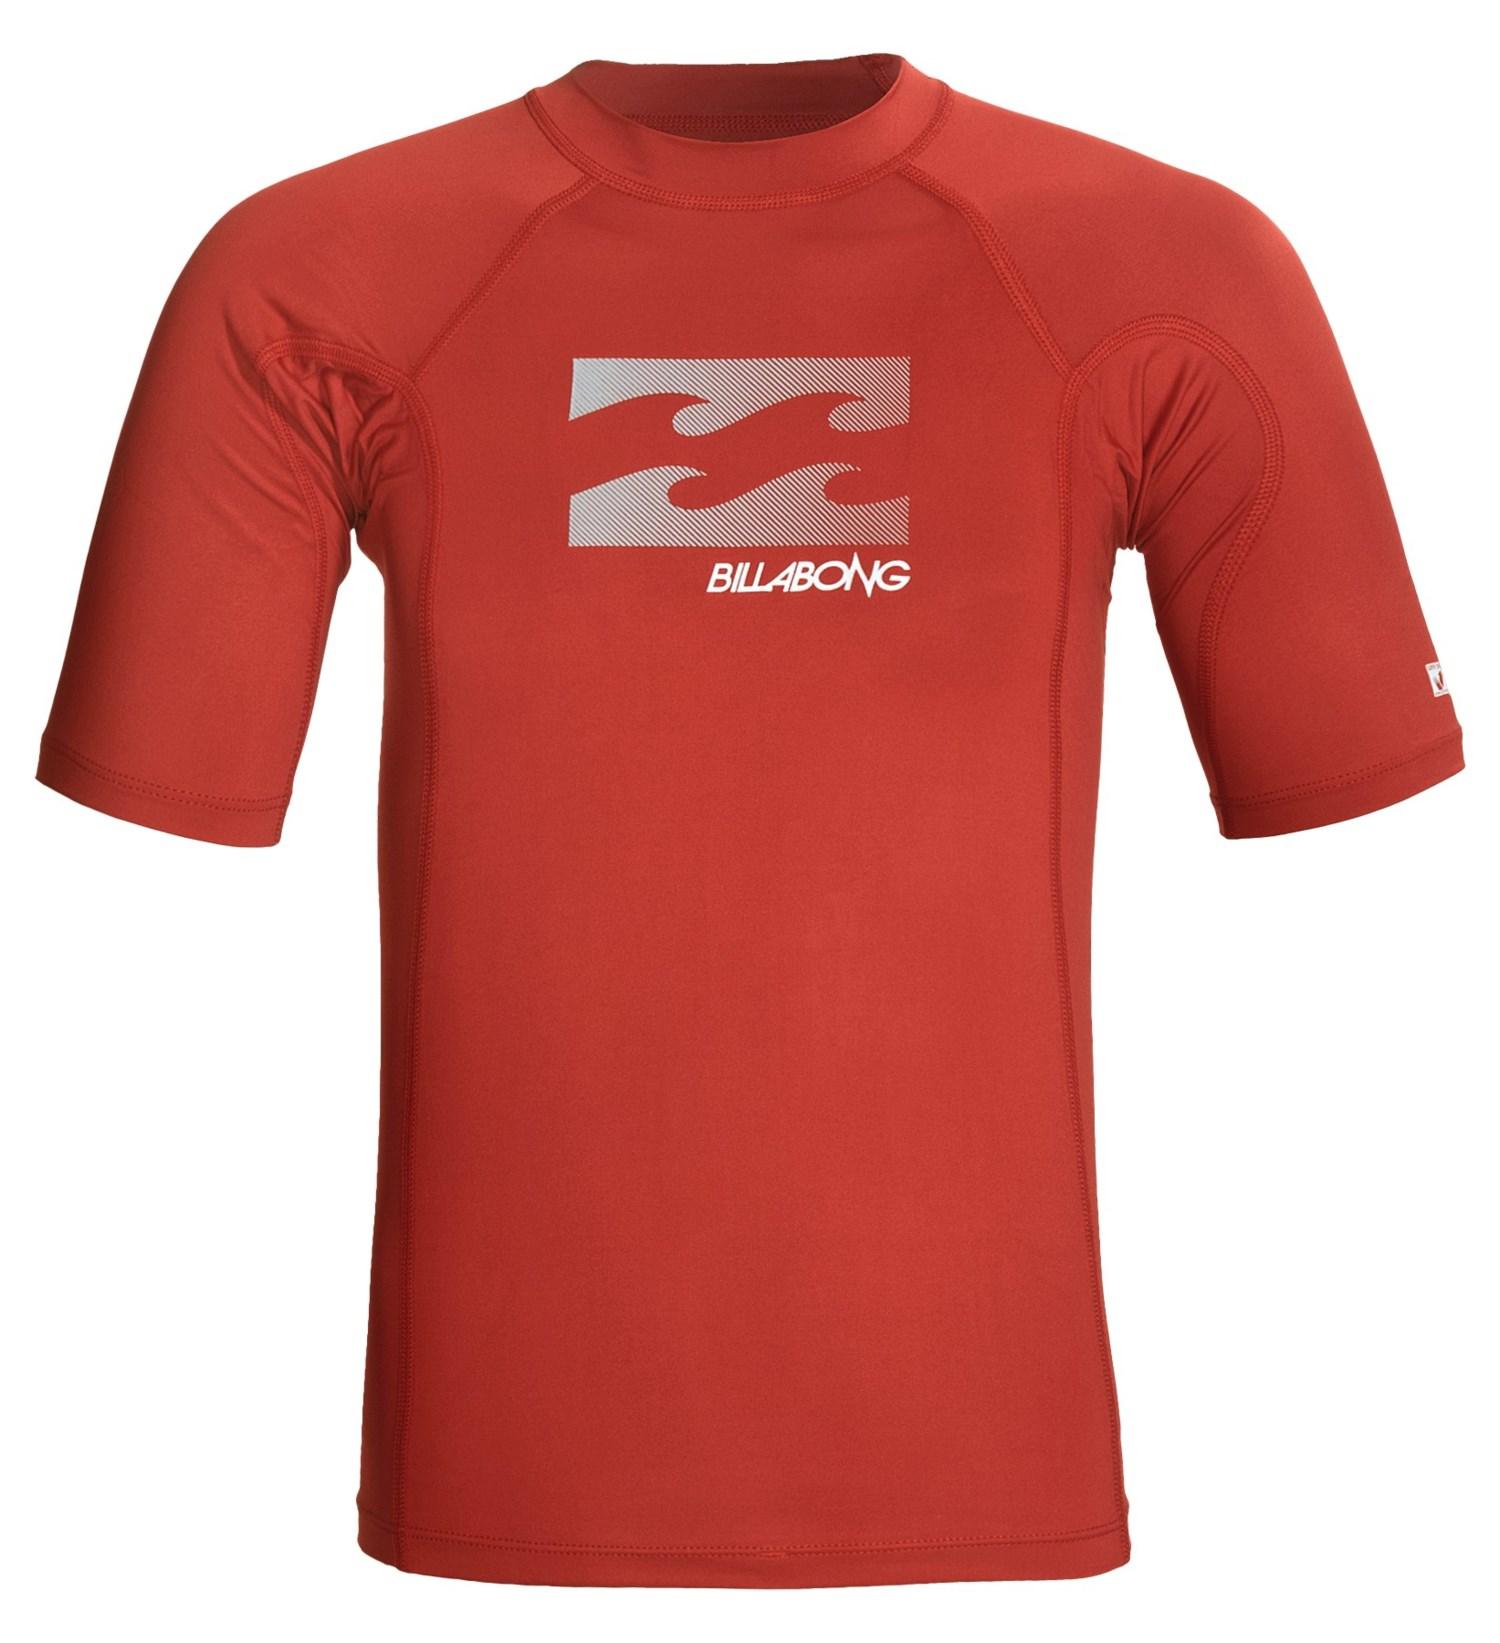 Billabong Shelter Rash Guard Shirt For Men 4711j Save 50